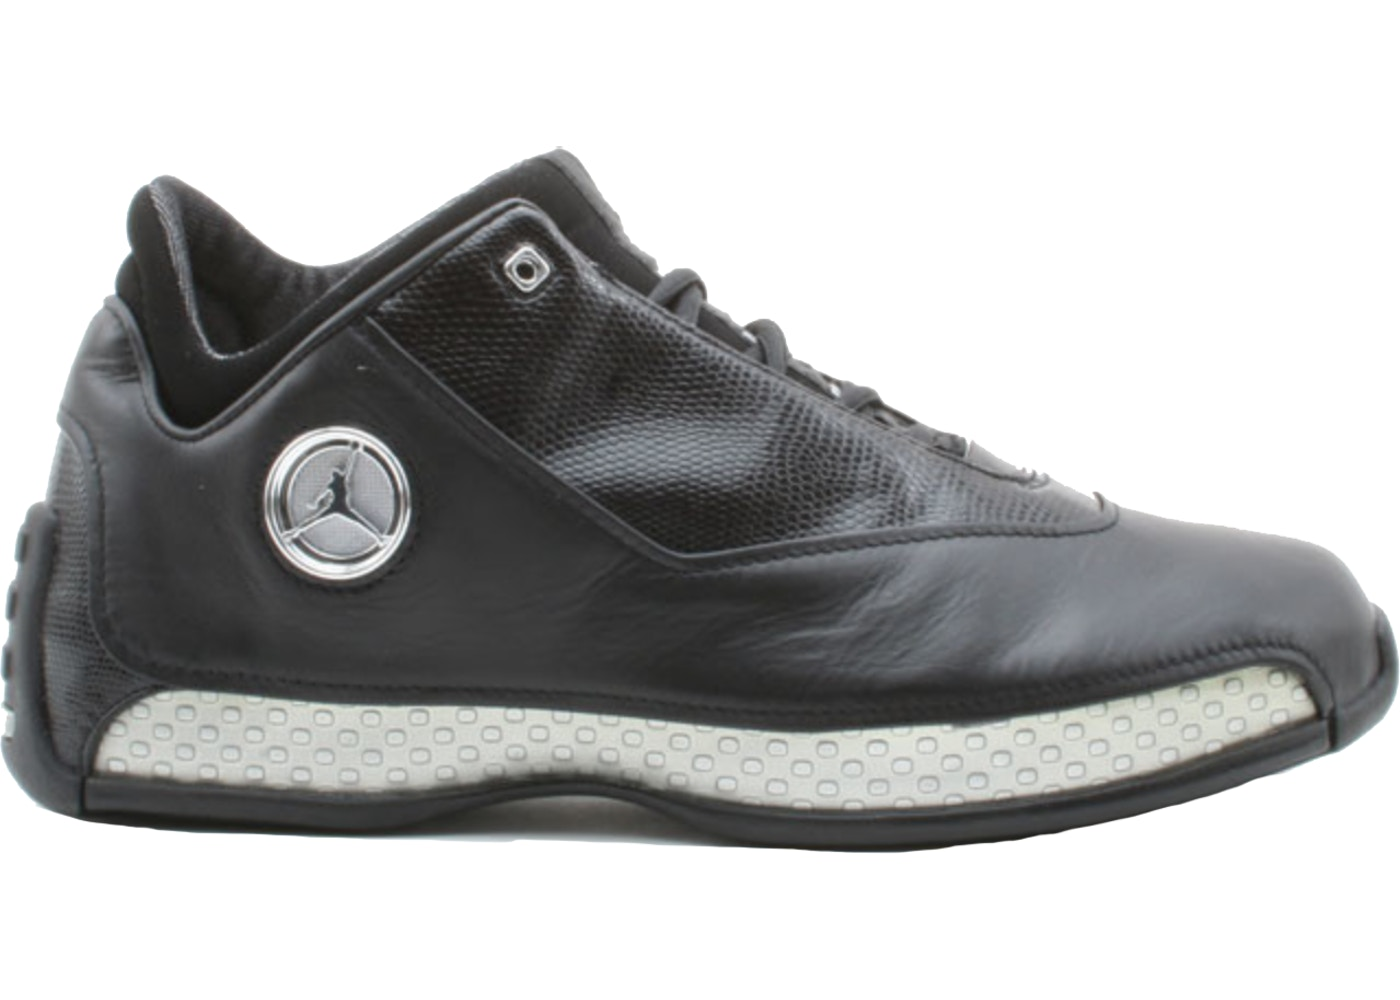 1486a0340c7 Jordan 18 OG Low Black Silver Chrome - 306151-001